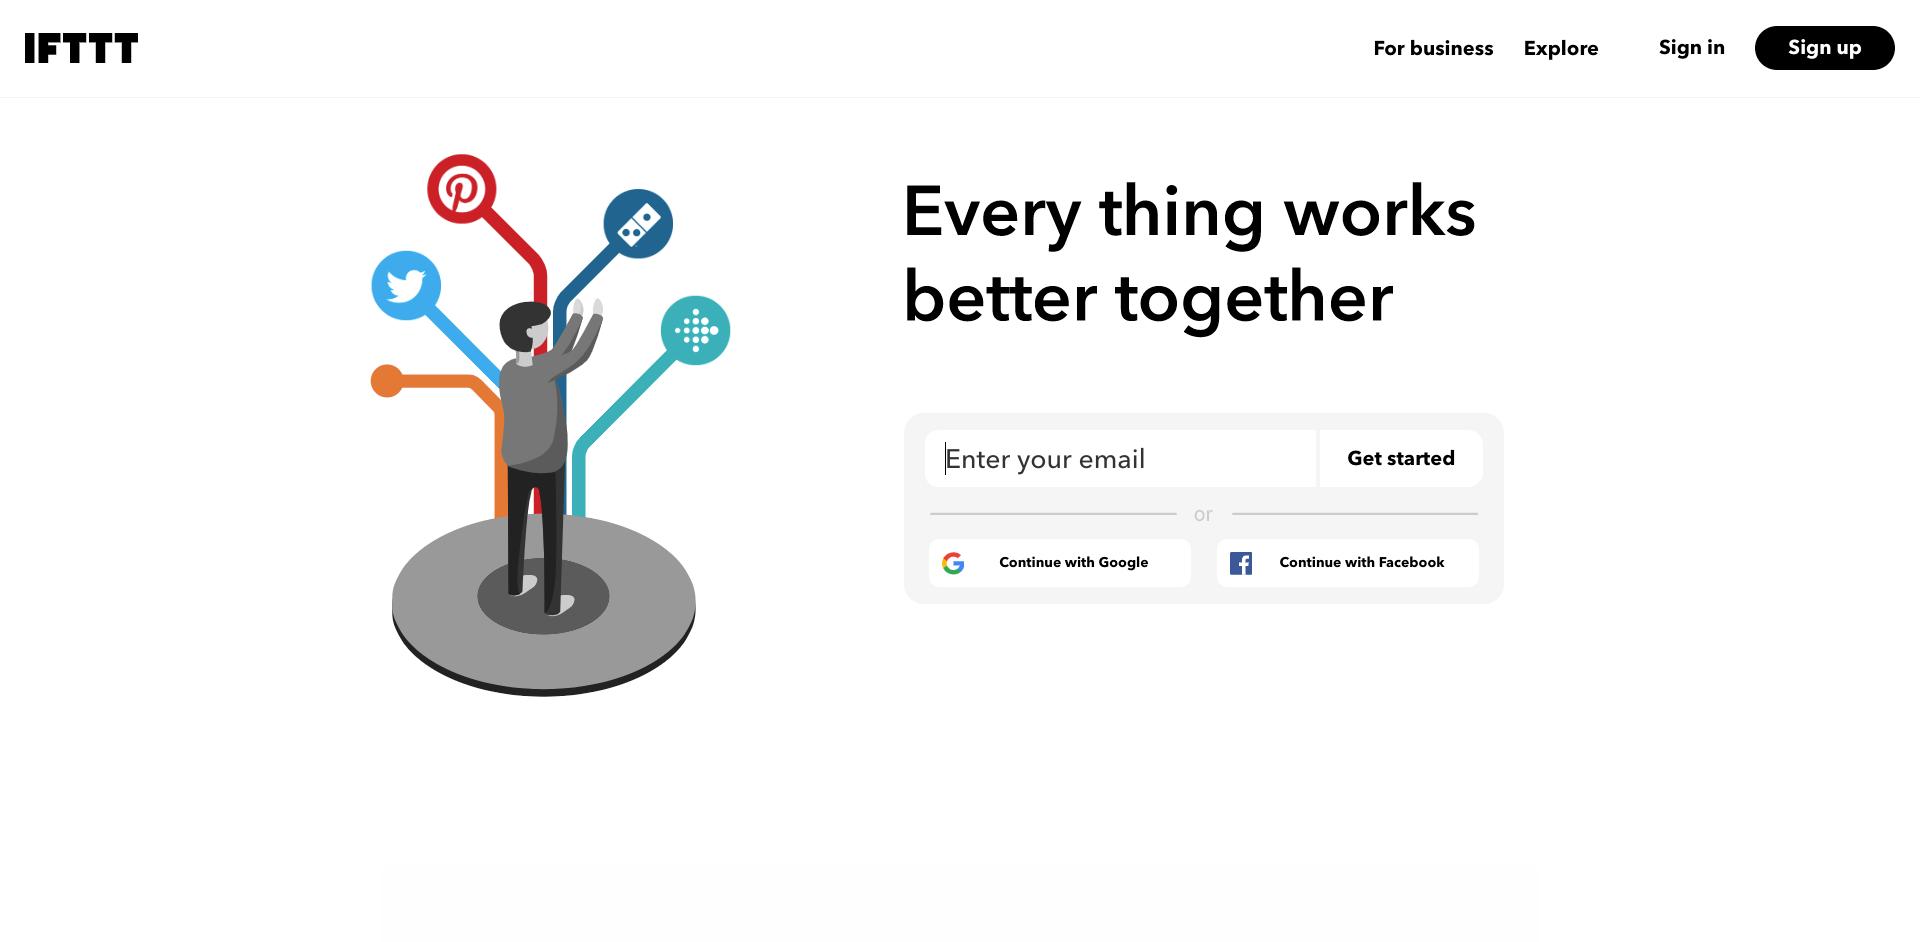 IFTTT homepage screenshot